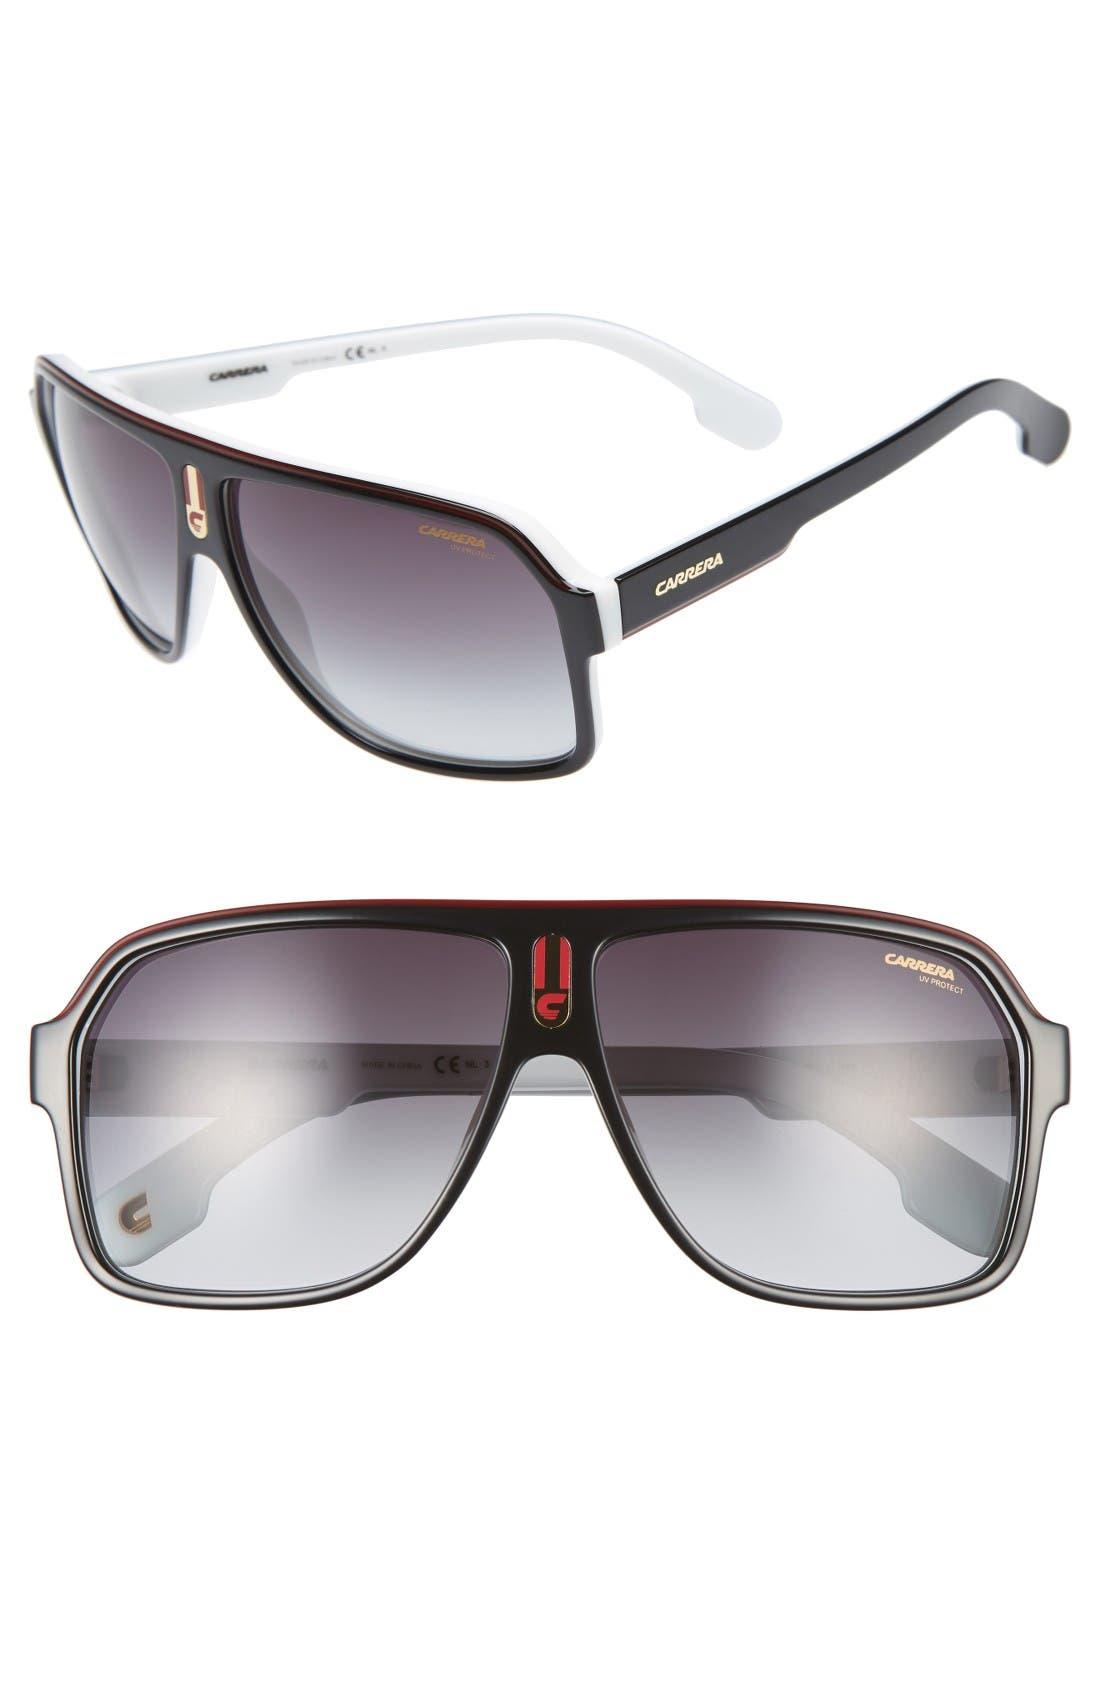 62mm Aviator Sunglasses,                             Main thumbnail 1, color,                             Black White